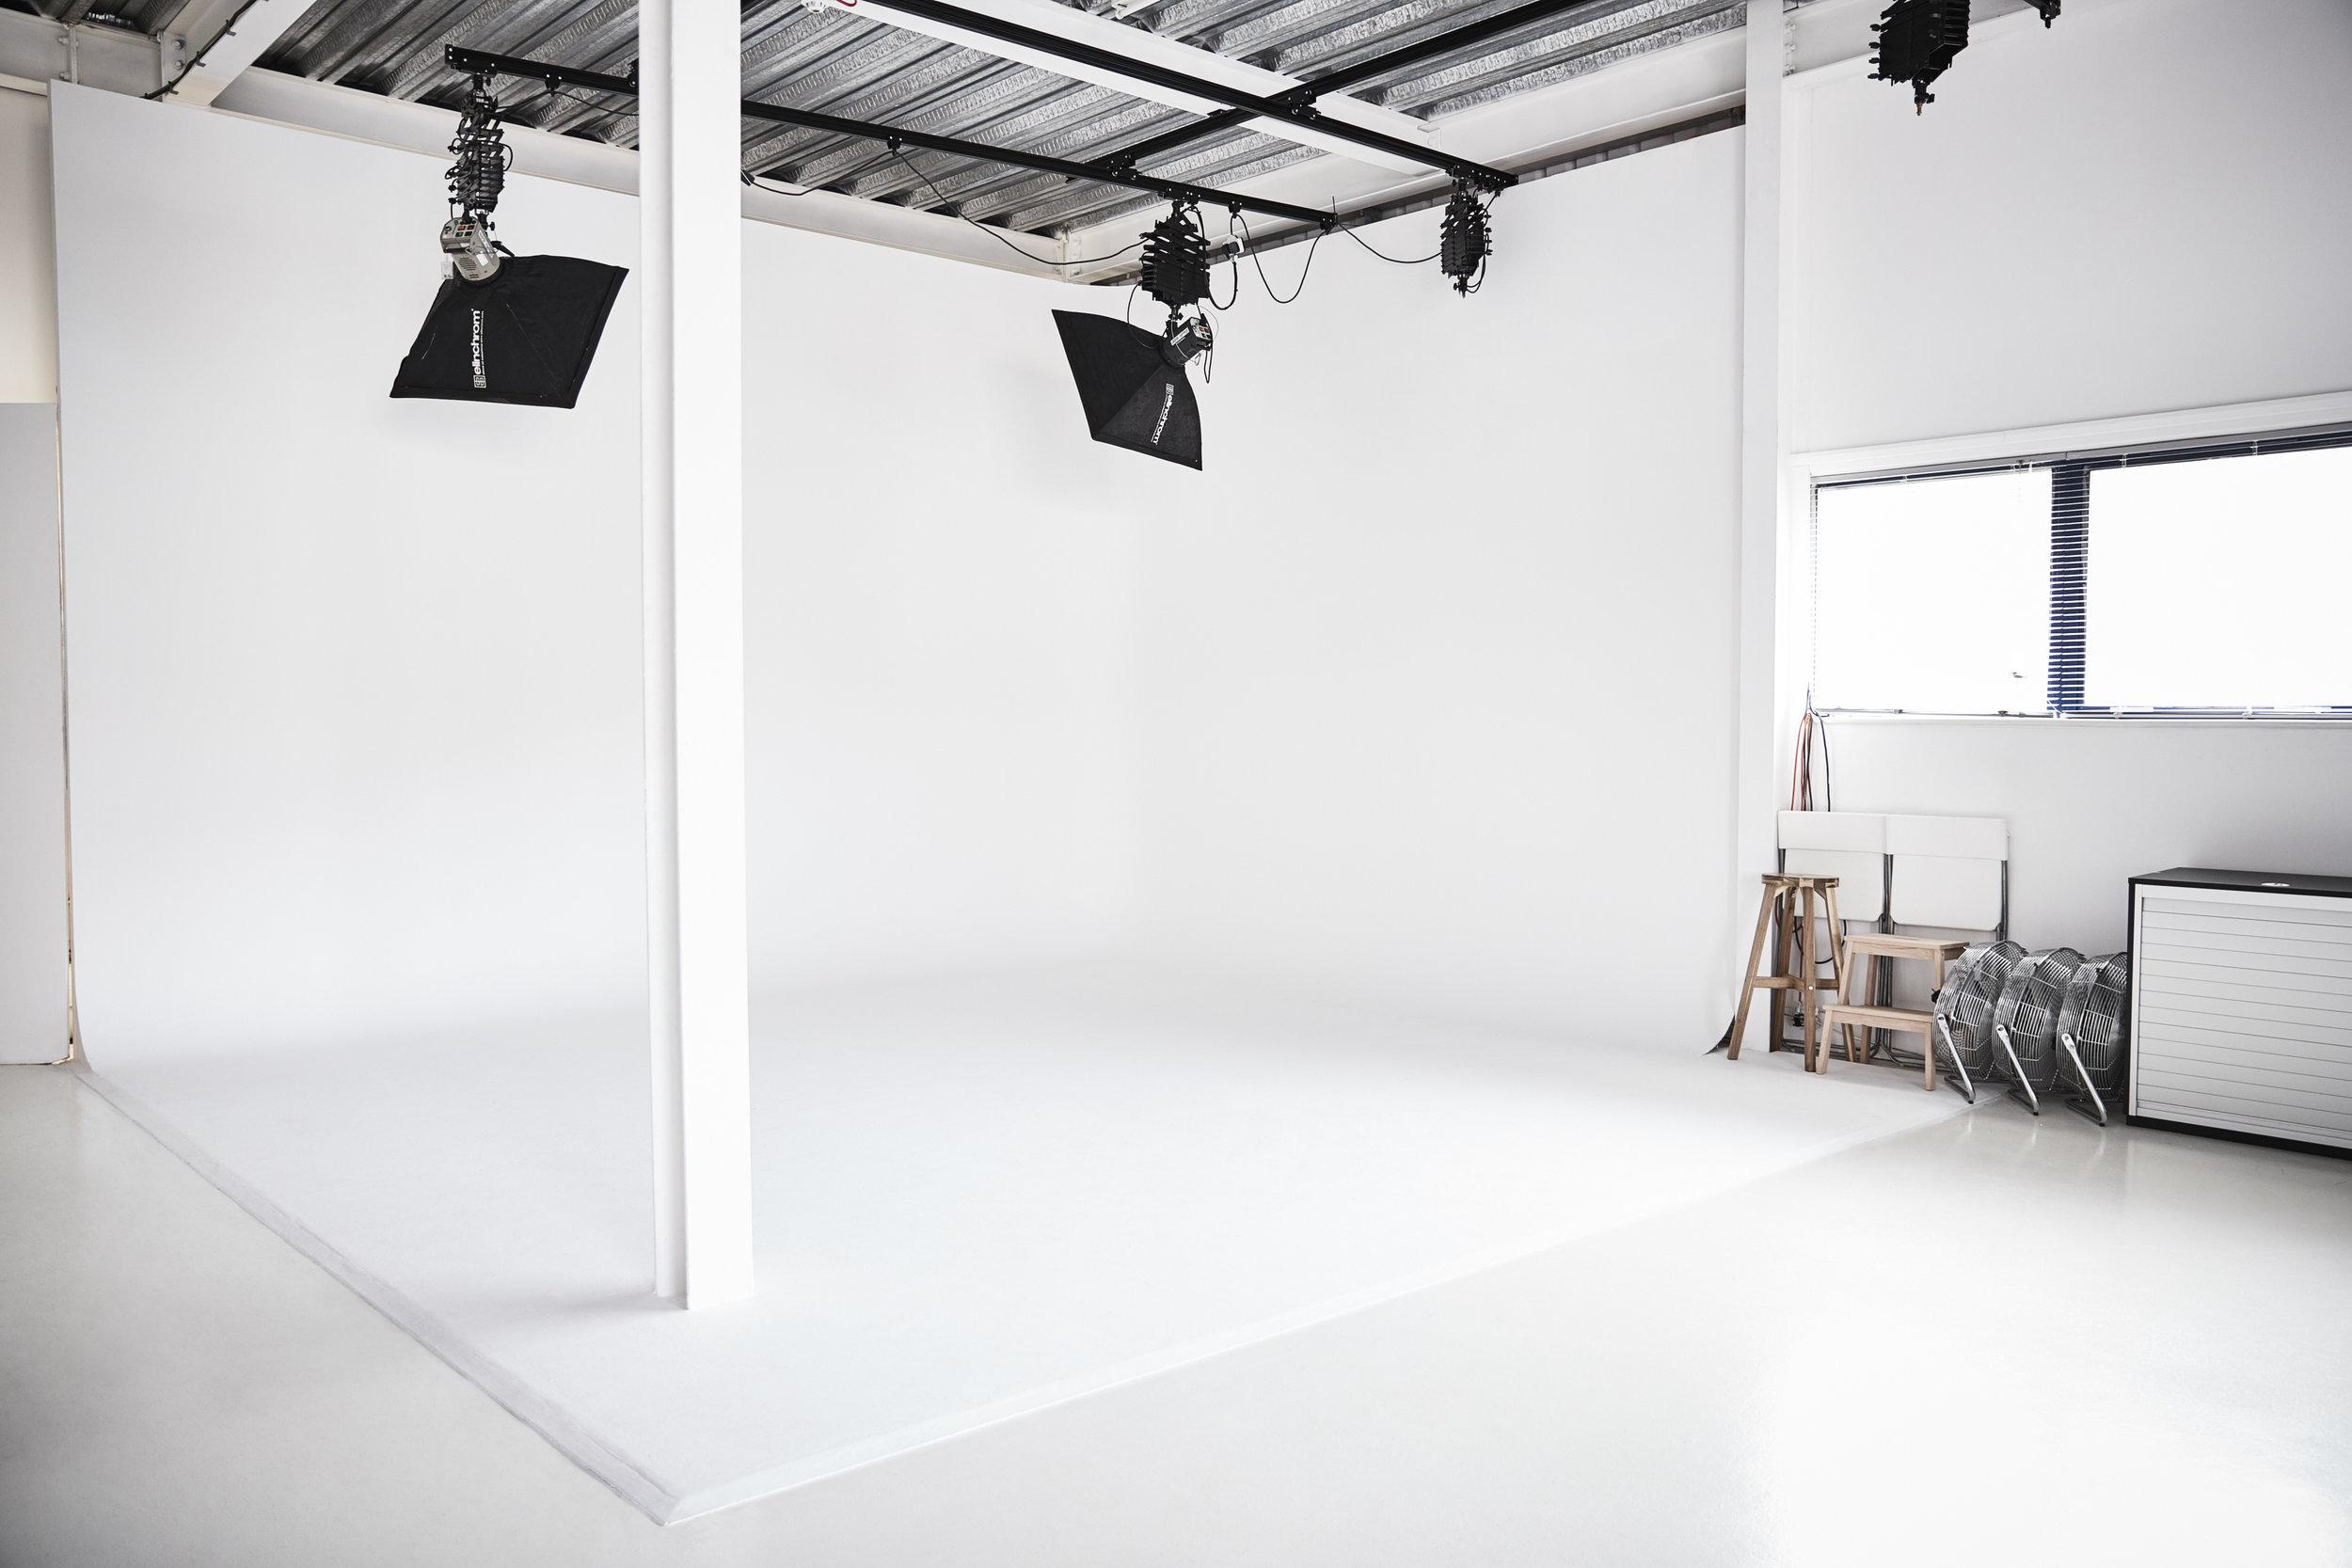 Studio -26375.jpg